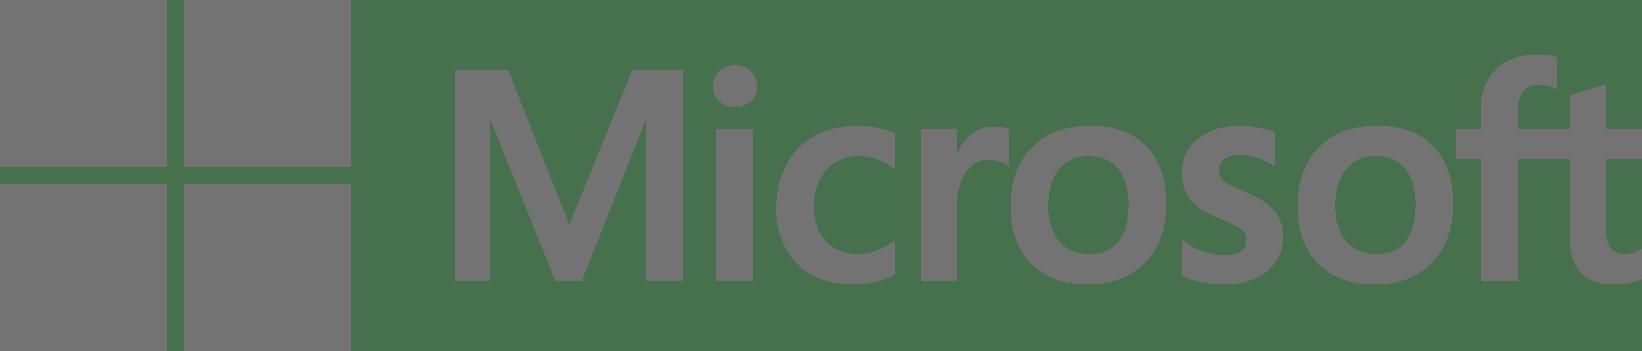 Microsoft logo grey 59dac7.png?ixlib=rb 1.1